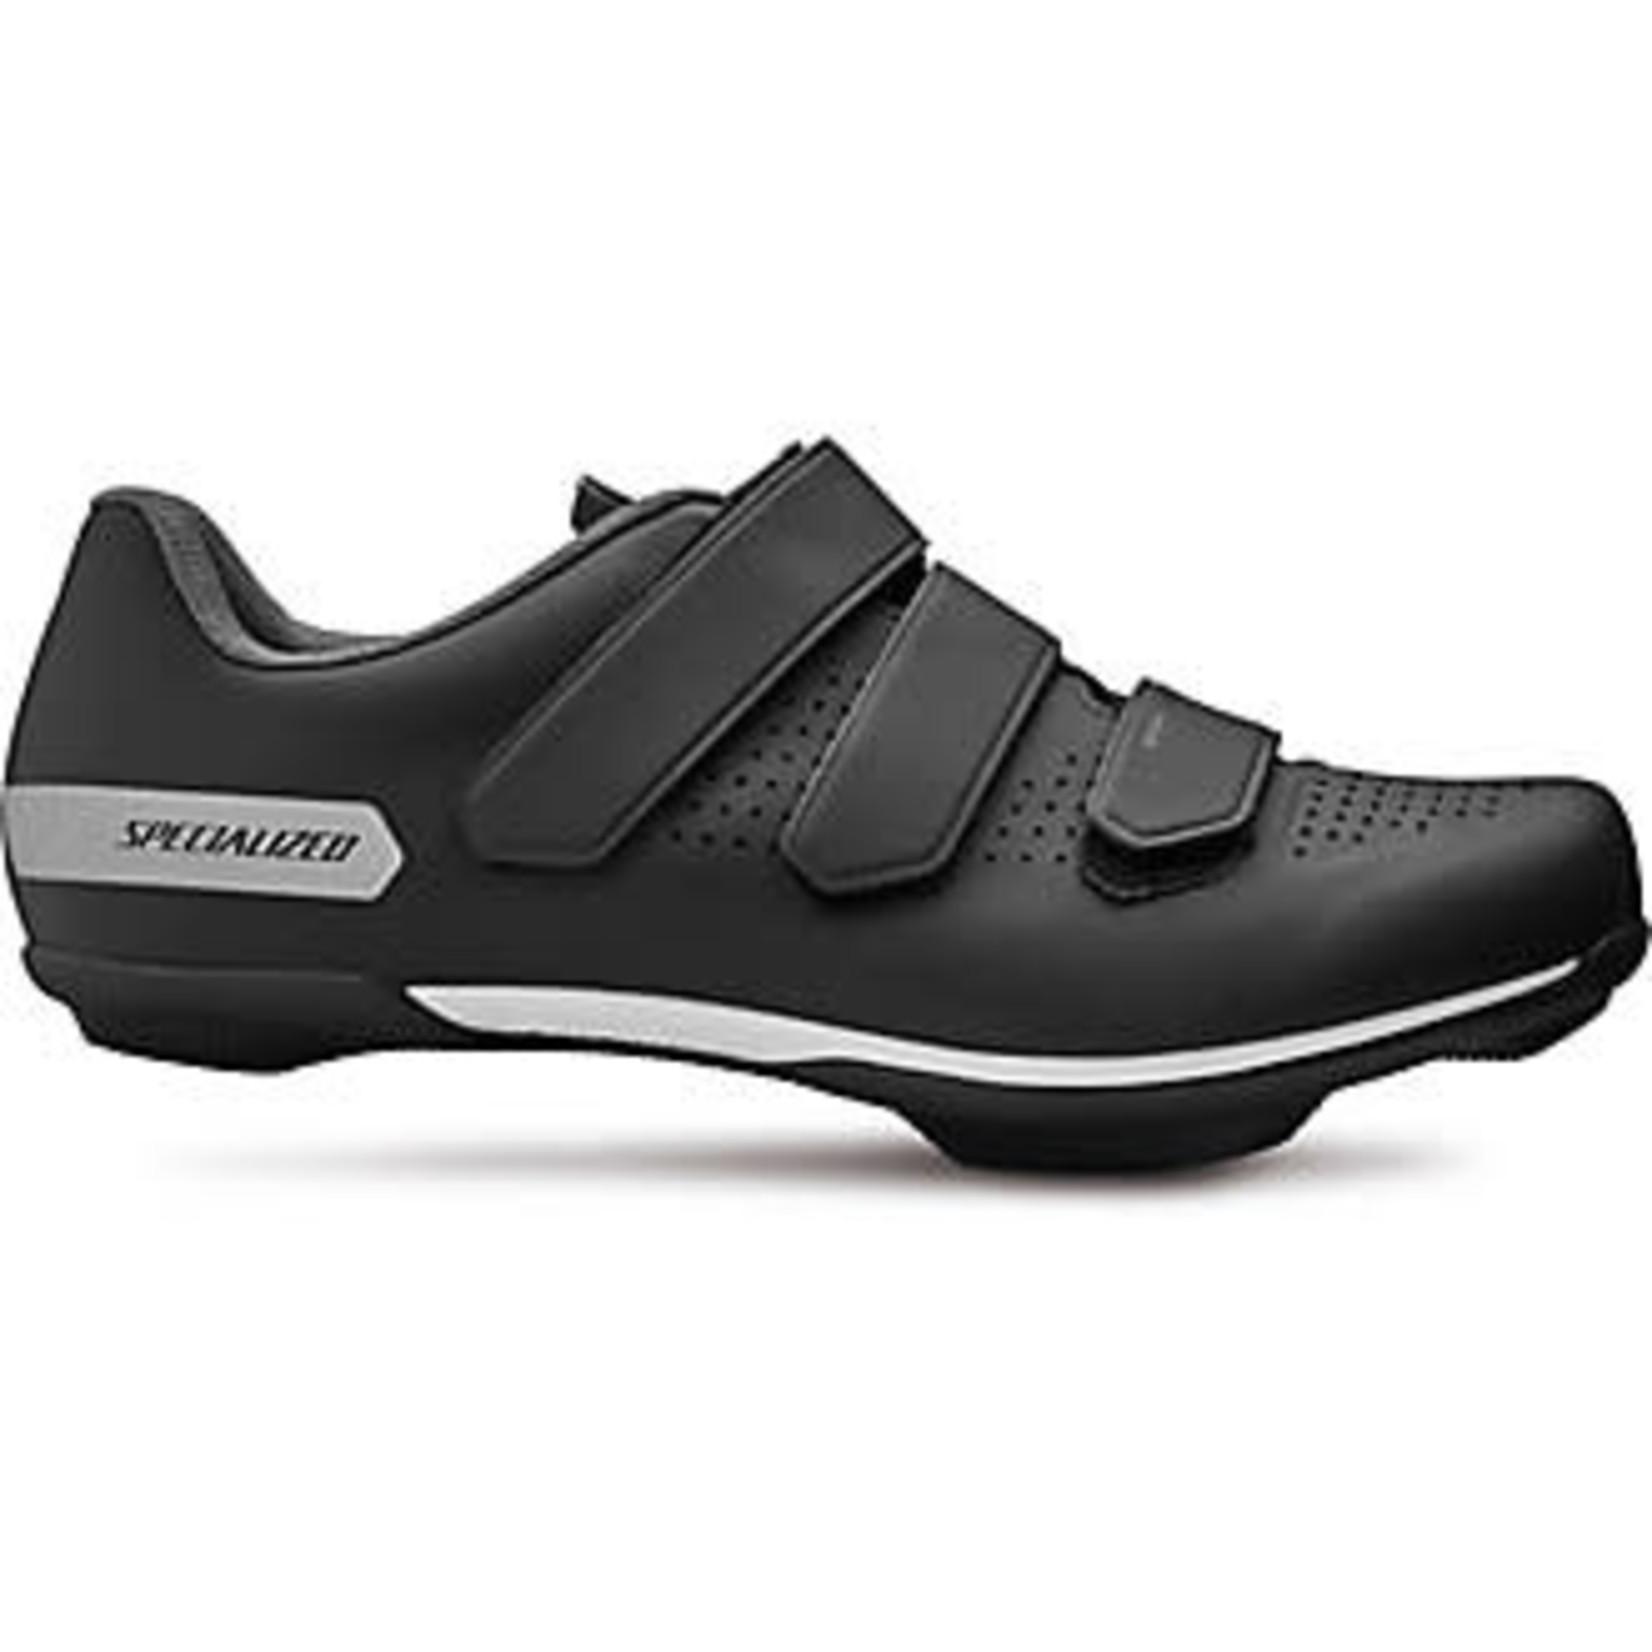 Specialized Specialized Sport RBX Shoes